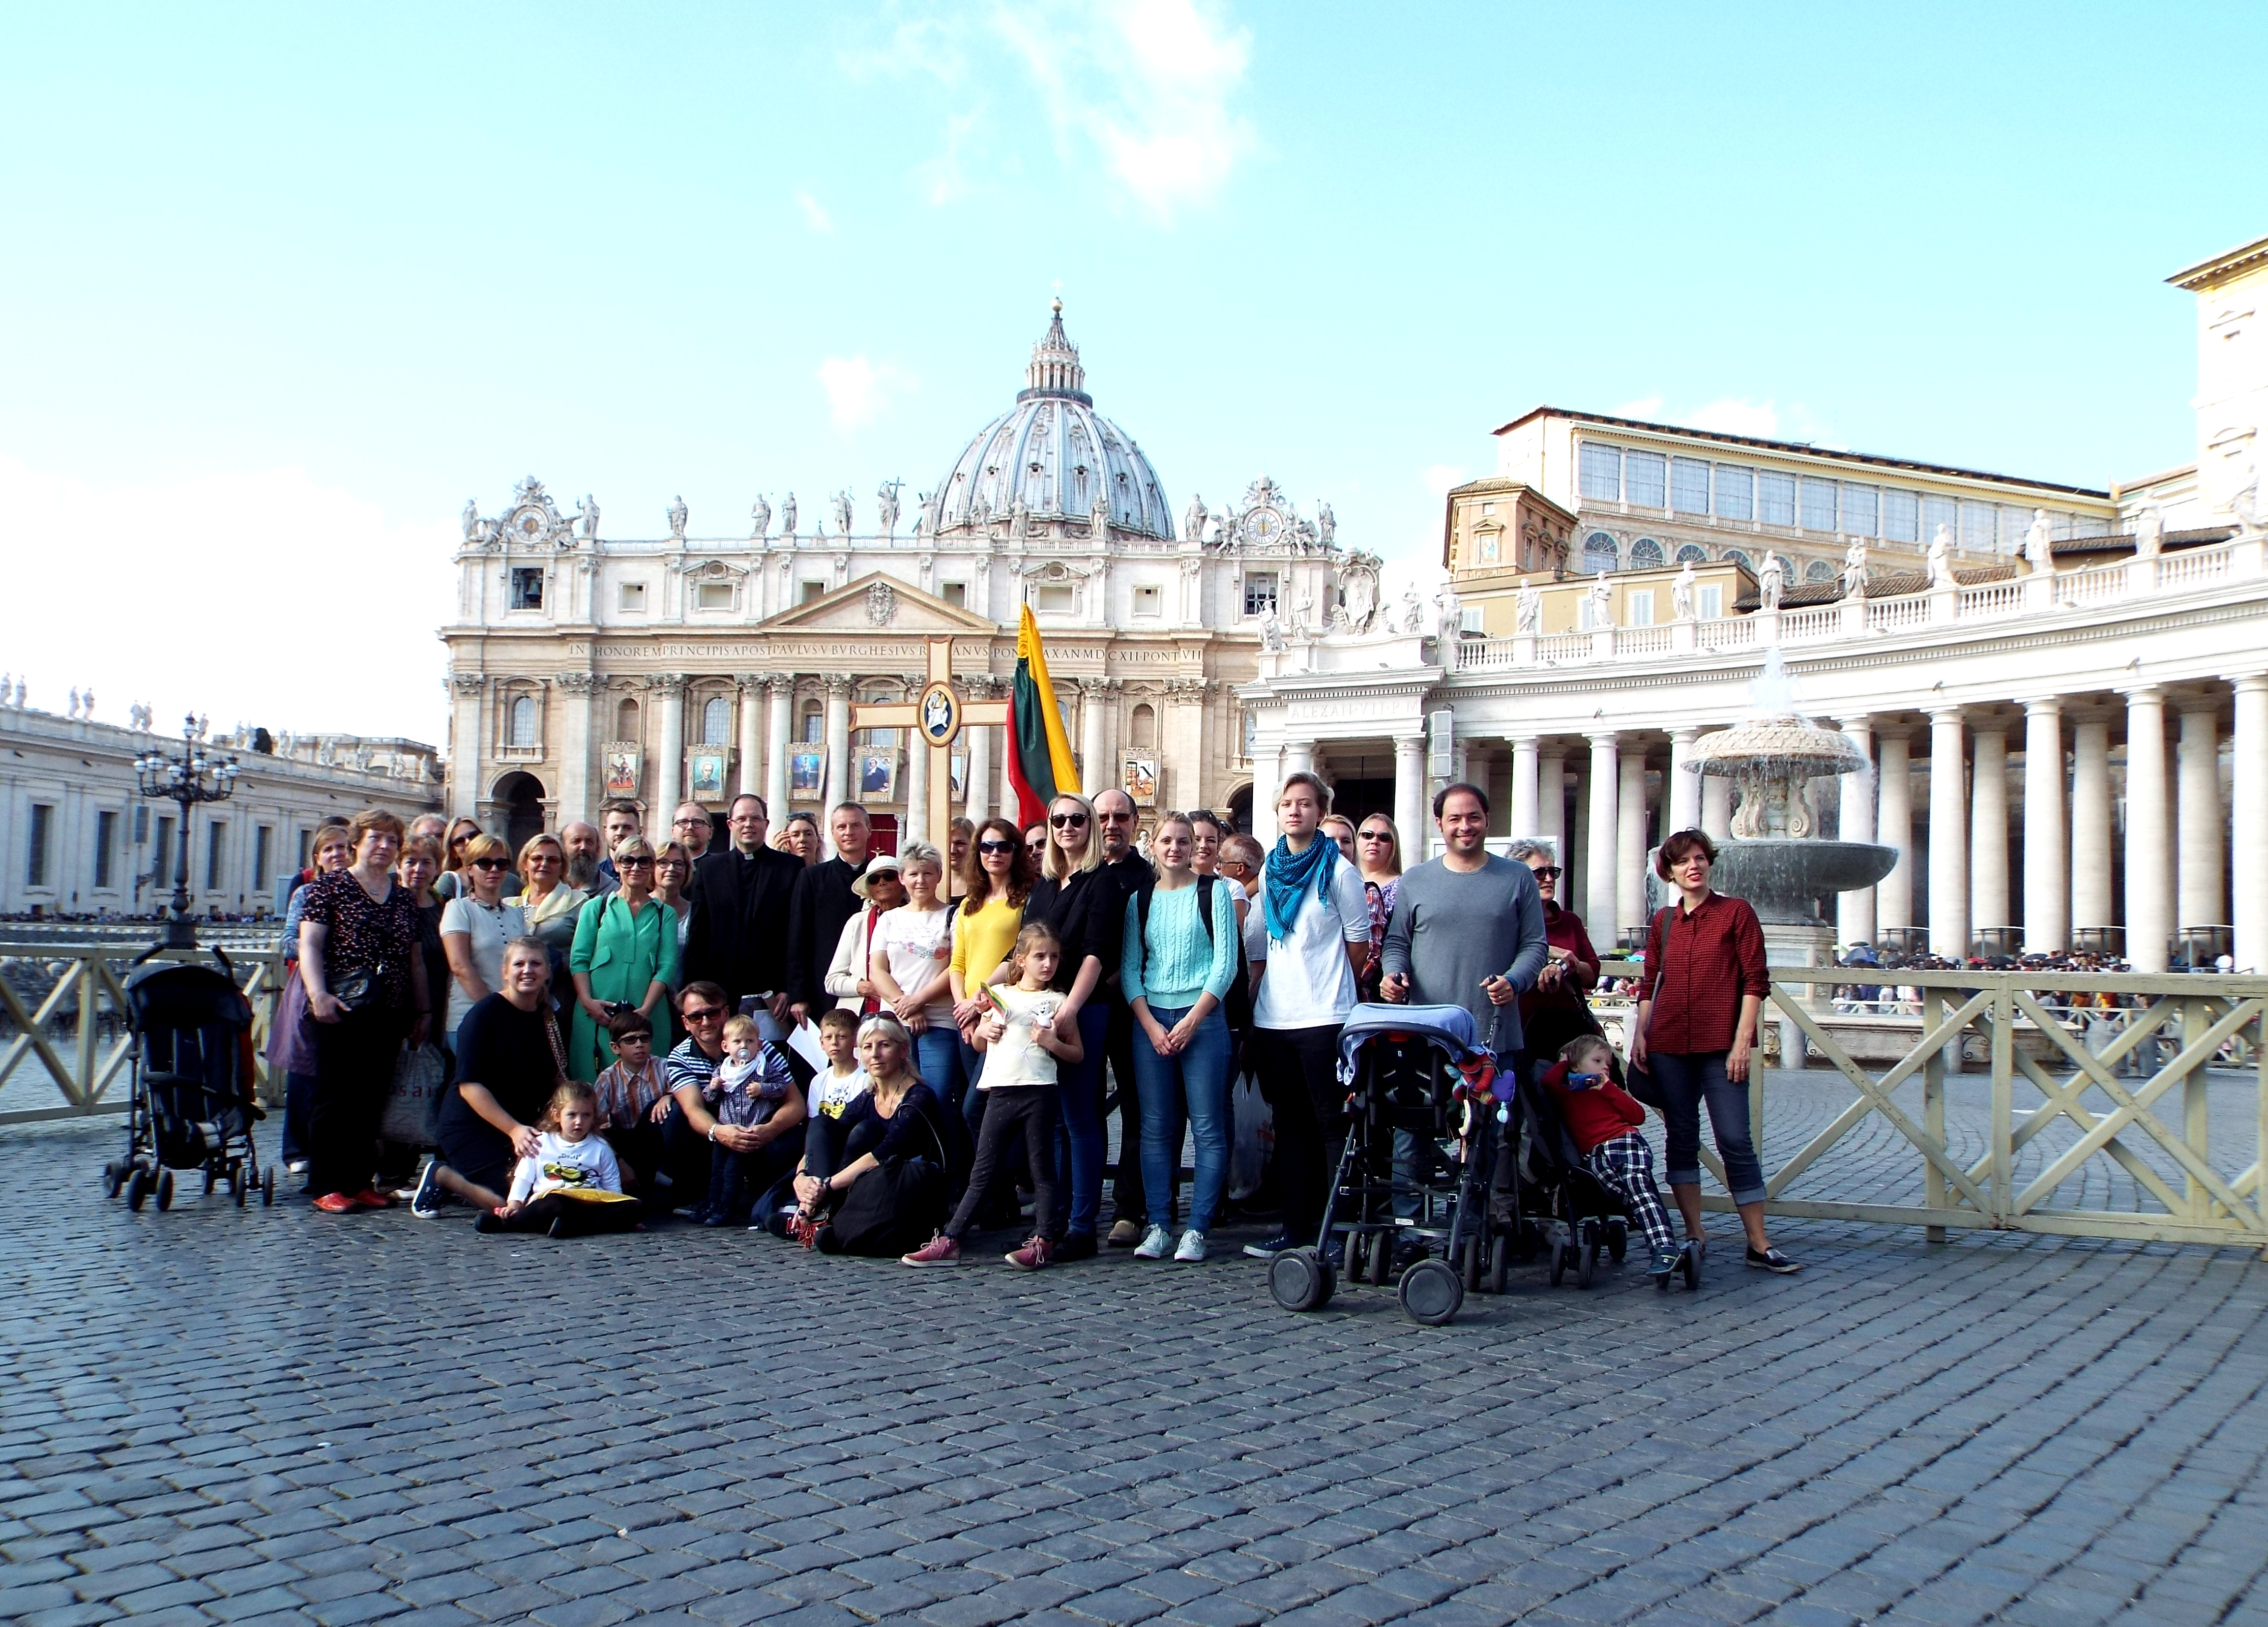 Vatikanas, piligriminis žygis